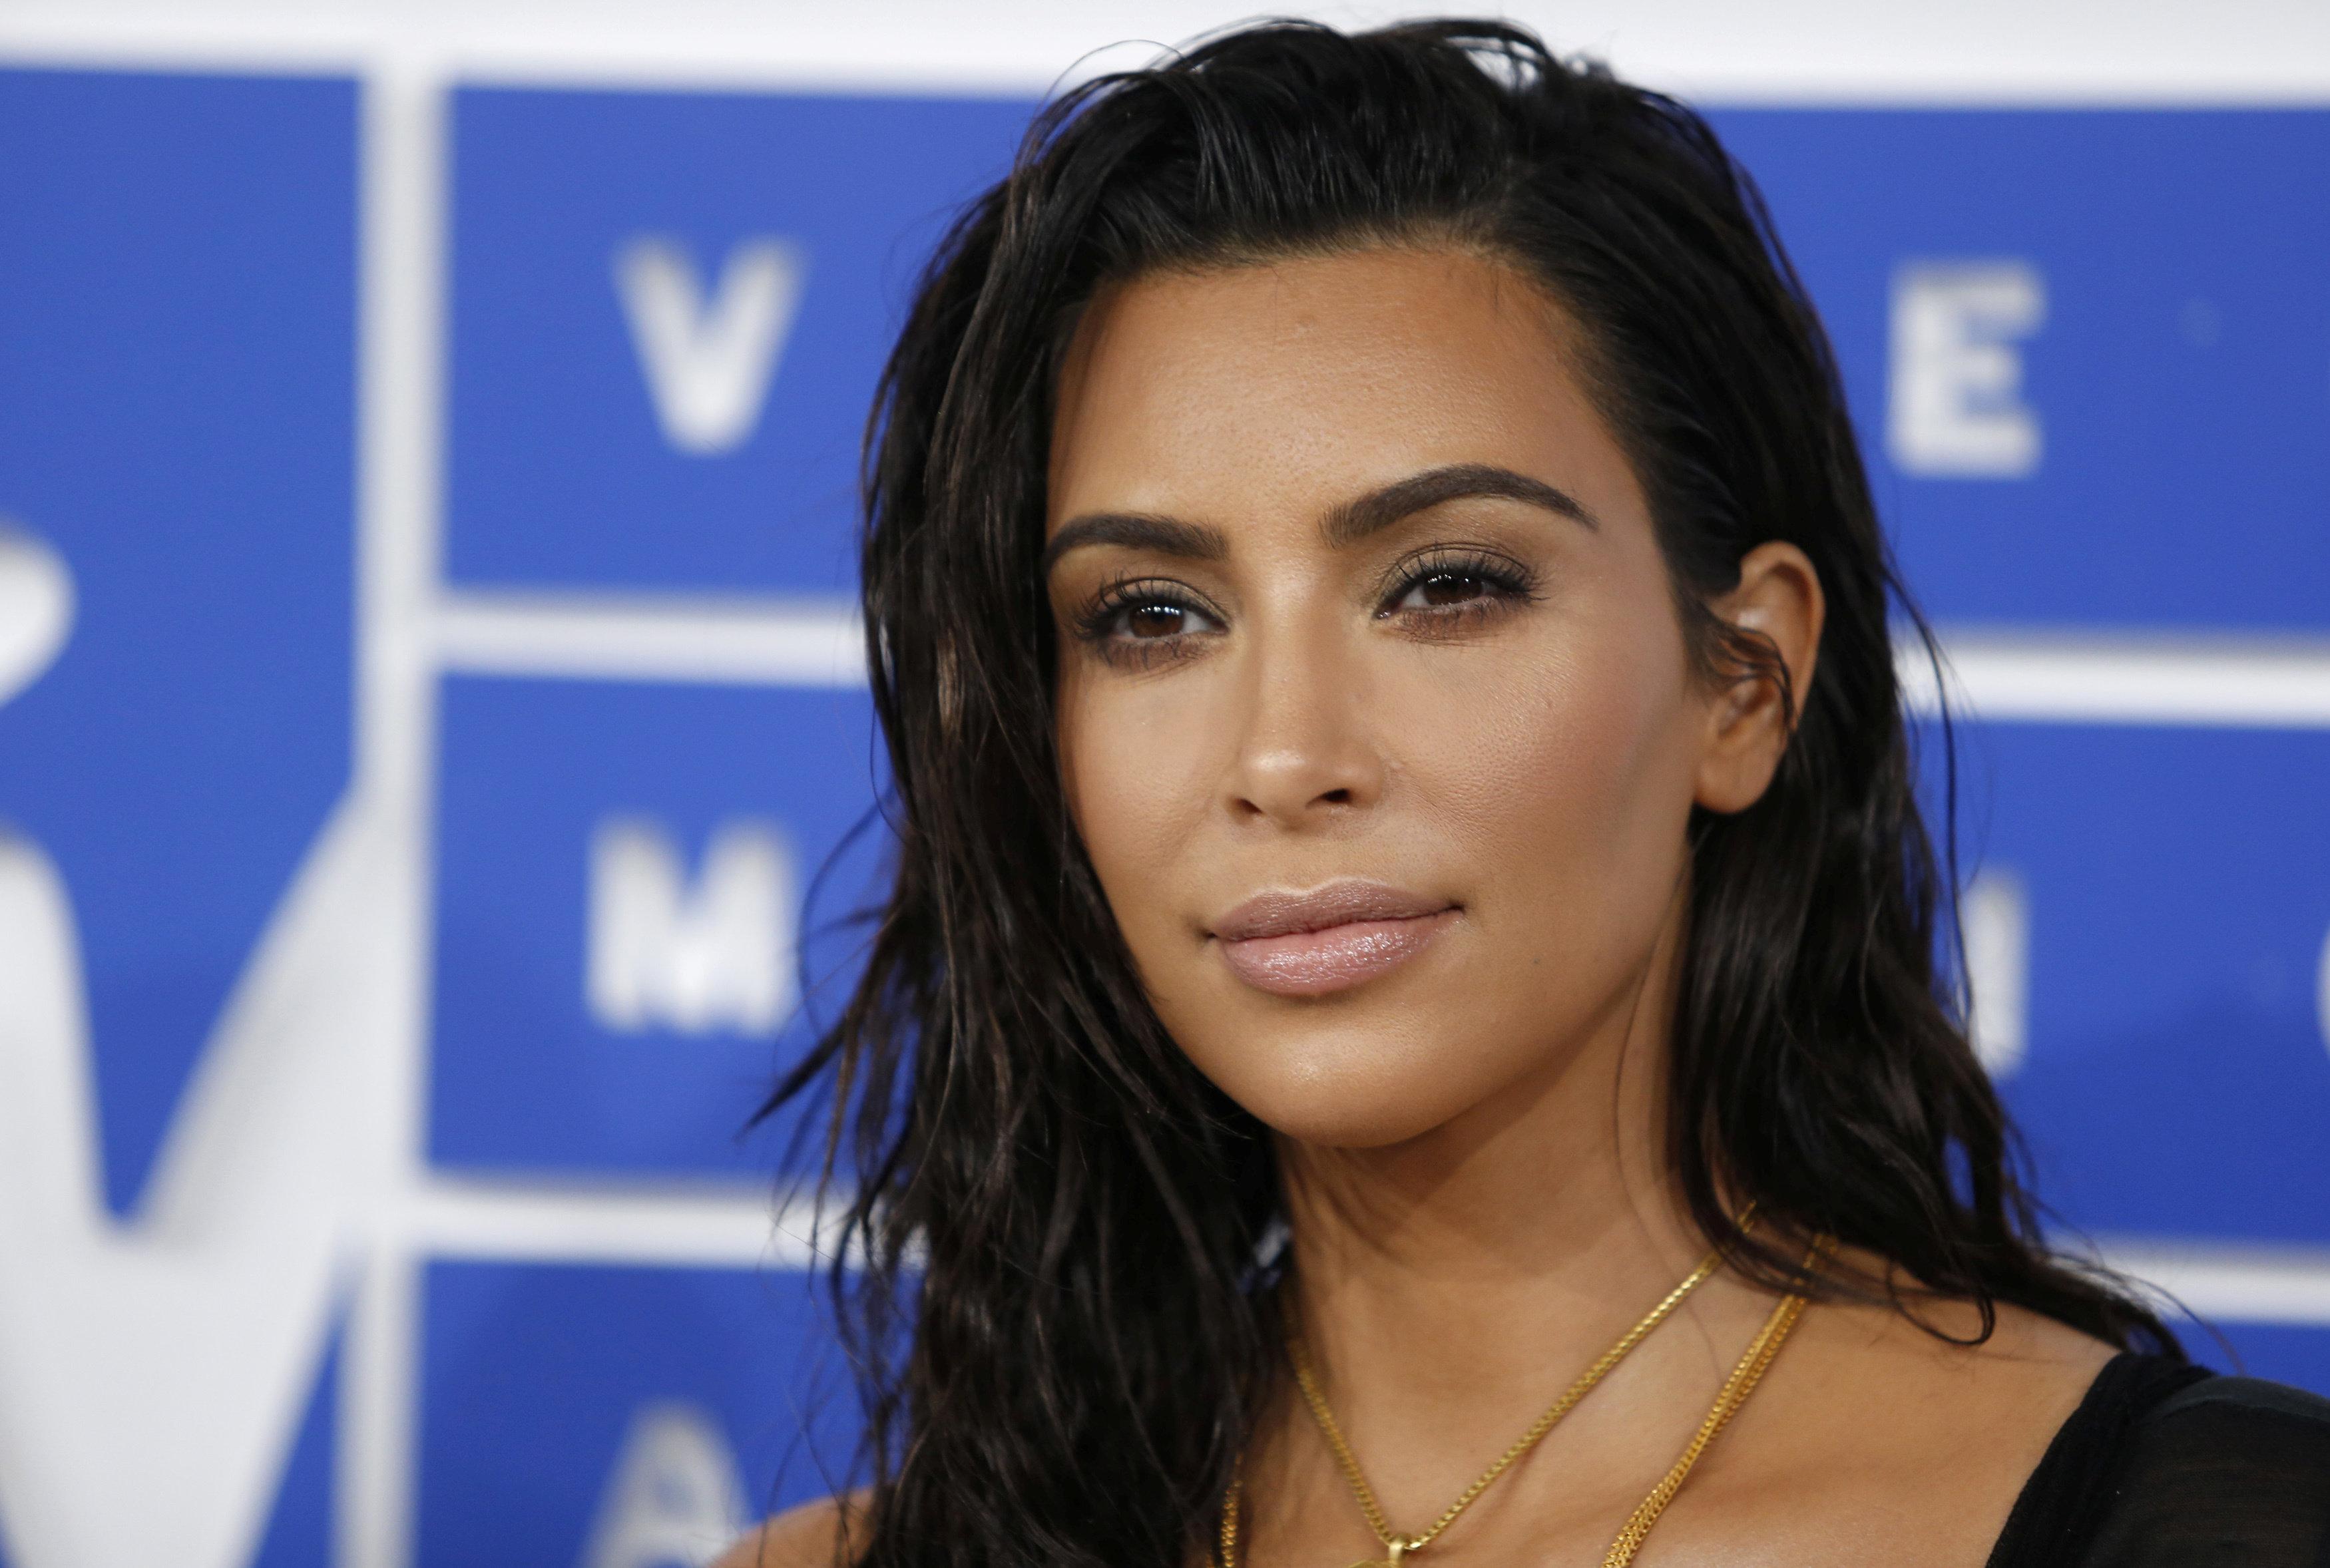 Kim Kardashian Has Gone Platinum Blonde And Looks Incredible